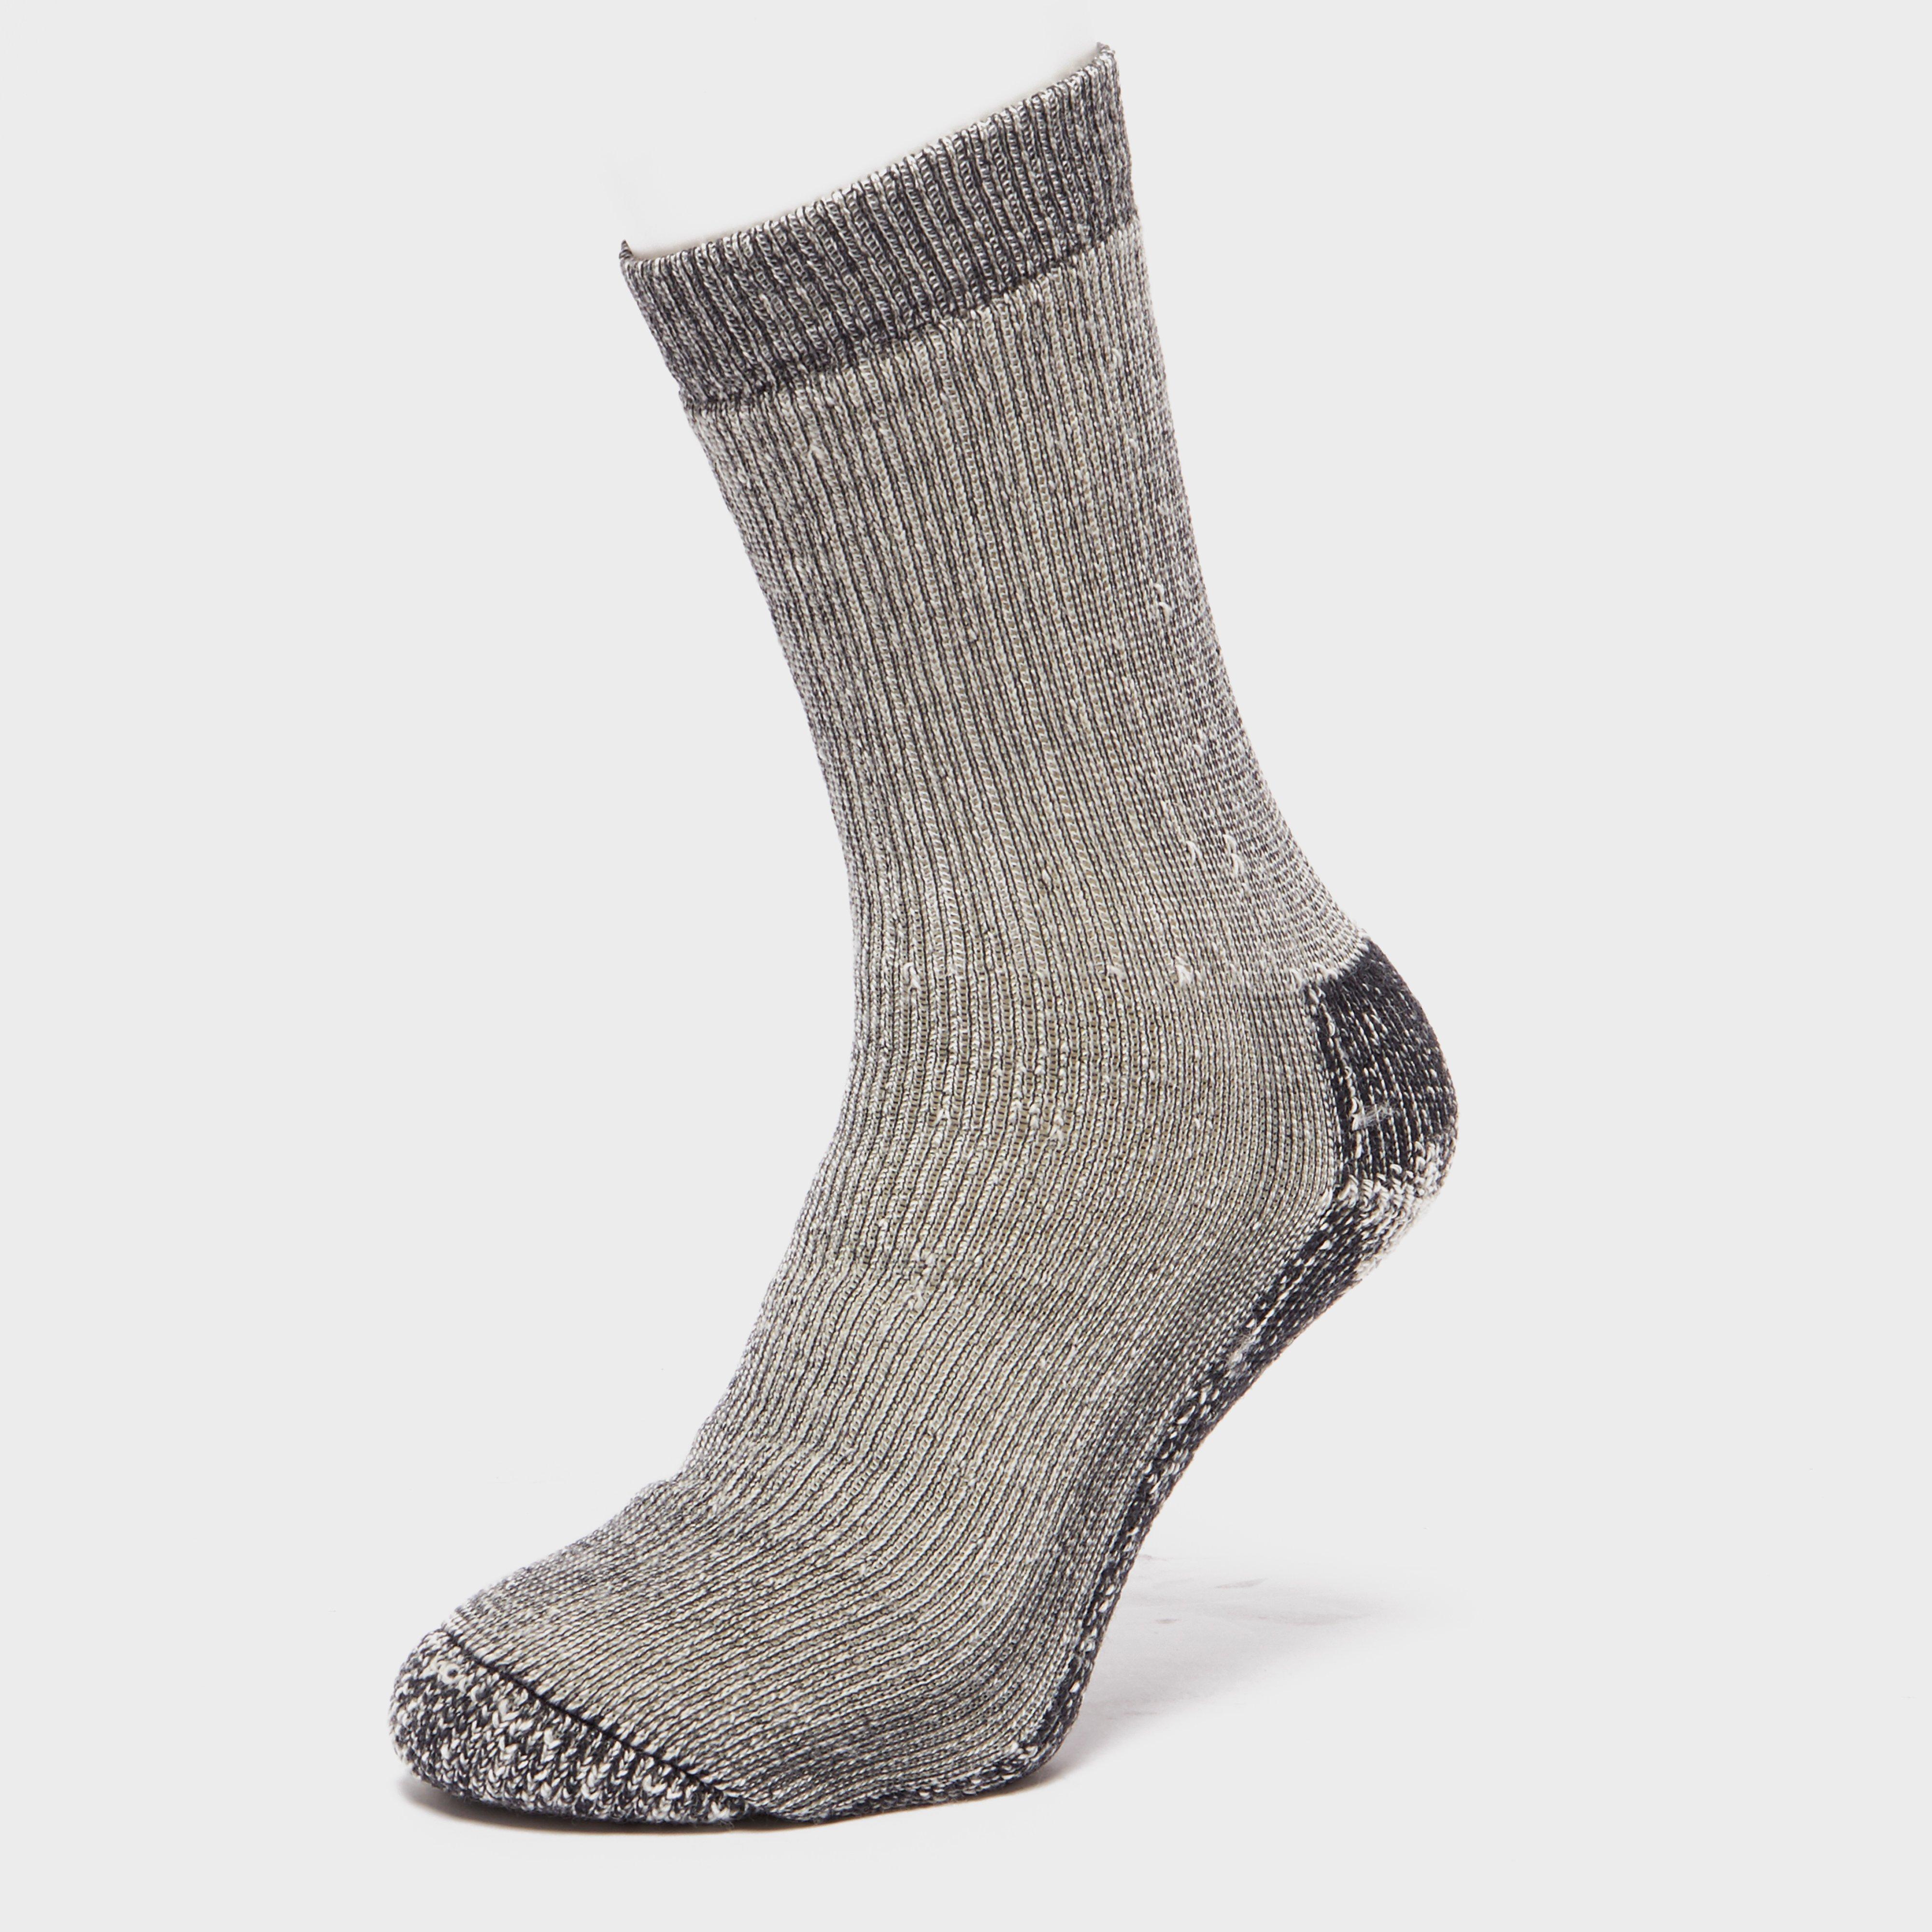 Smartwool Trekking Heavy Crew Socks - Grey, Grey